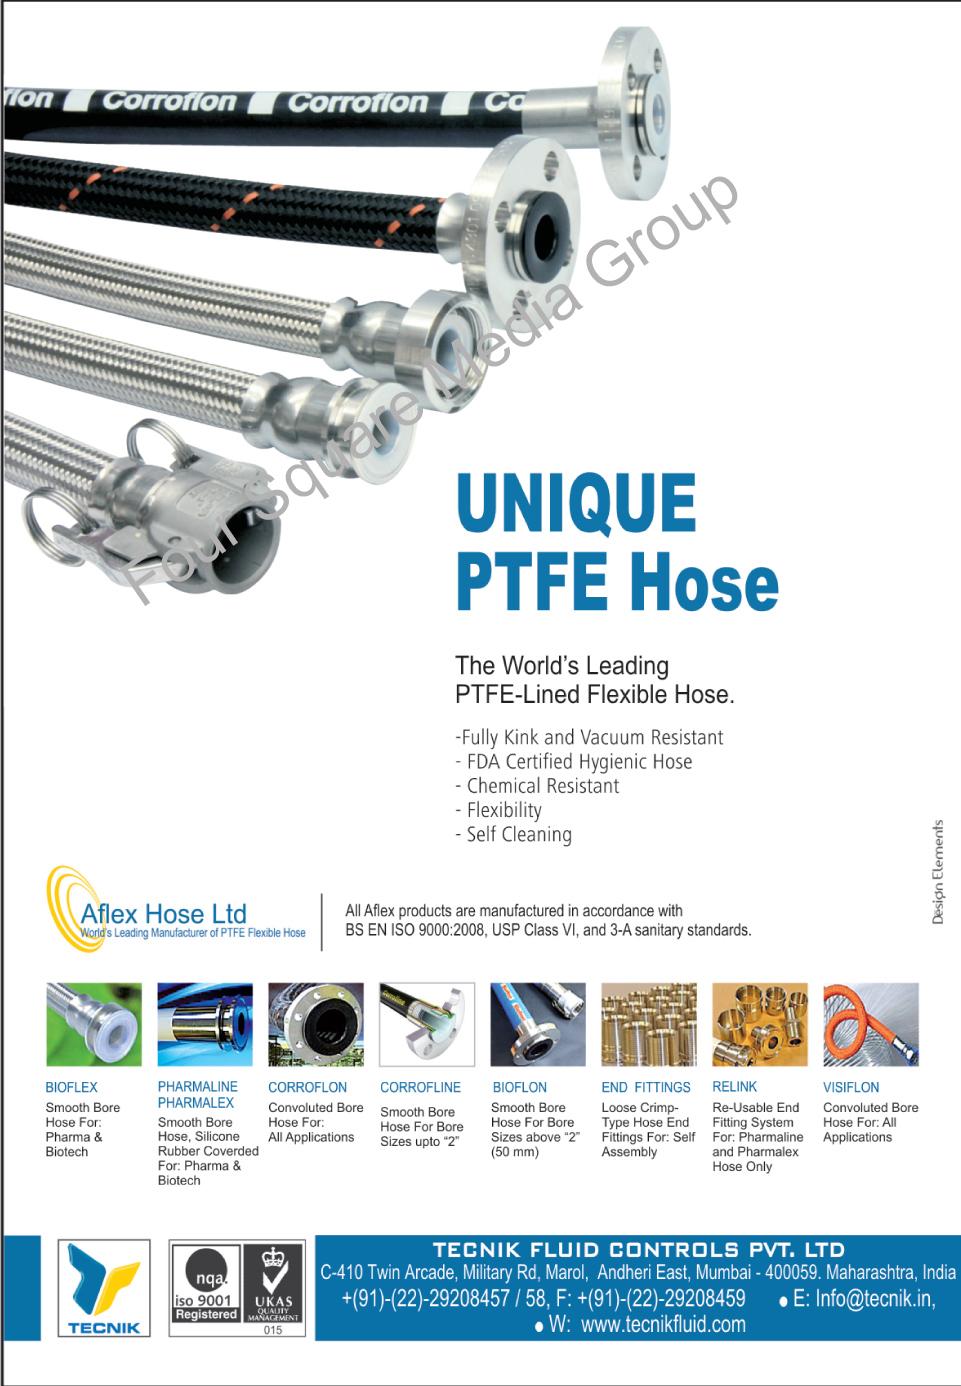 PTFE Flexible Hoses, PTFE Hoses, PTFE Lined Flexible Hoses, Silicone Flexible Tubings, PTFE Flexible Tubings, Phthalate Free PVC Tubings, PVDF Tubings, FEP Tubings, PFA Tubings, Peristaltic Tubings, Phi VI Tubings, Phi XL Tubings, Dairyflow LDPE Tubings, Dairyflow LLDPE Tubings, Superflex Tubings,Bioflex, Pharmaline Pharnalex, Corroflon, Corrofline, Bioflon, End Fittings, Relink, Visiflon